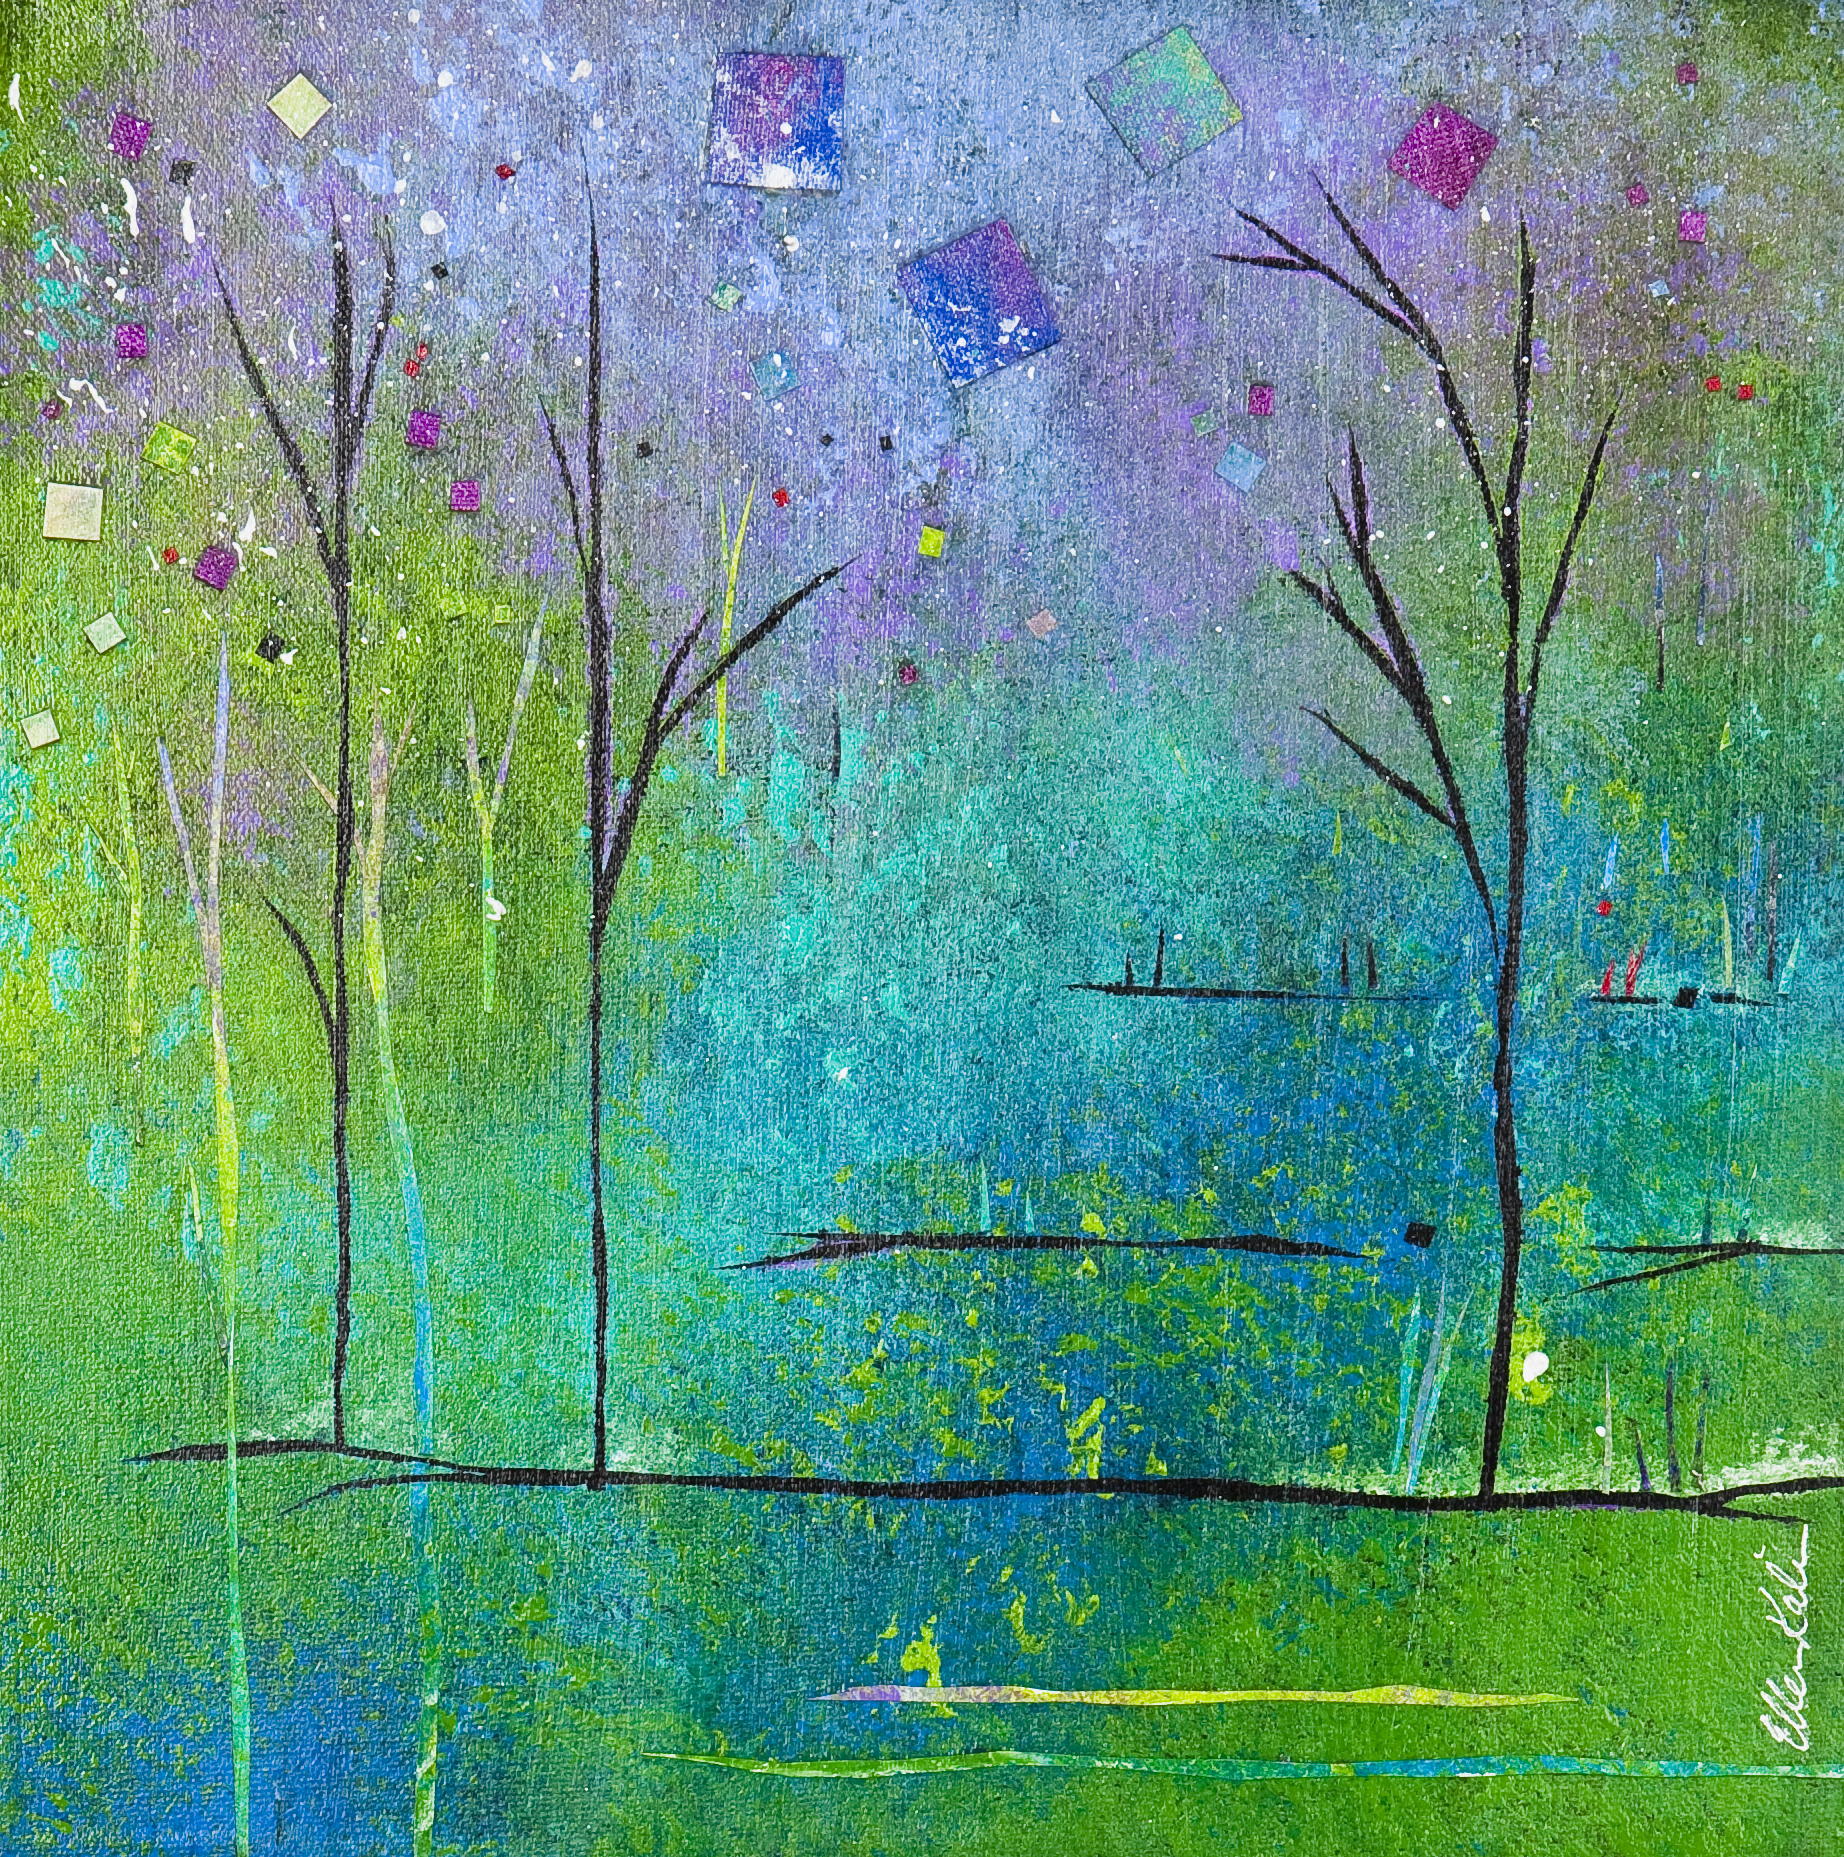 Trees & Terrace - 12x12, $300